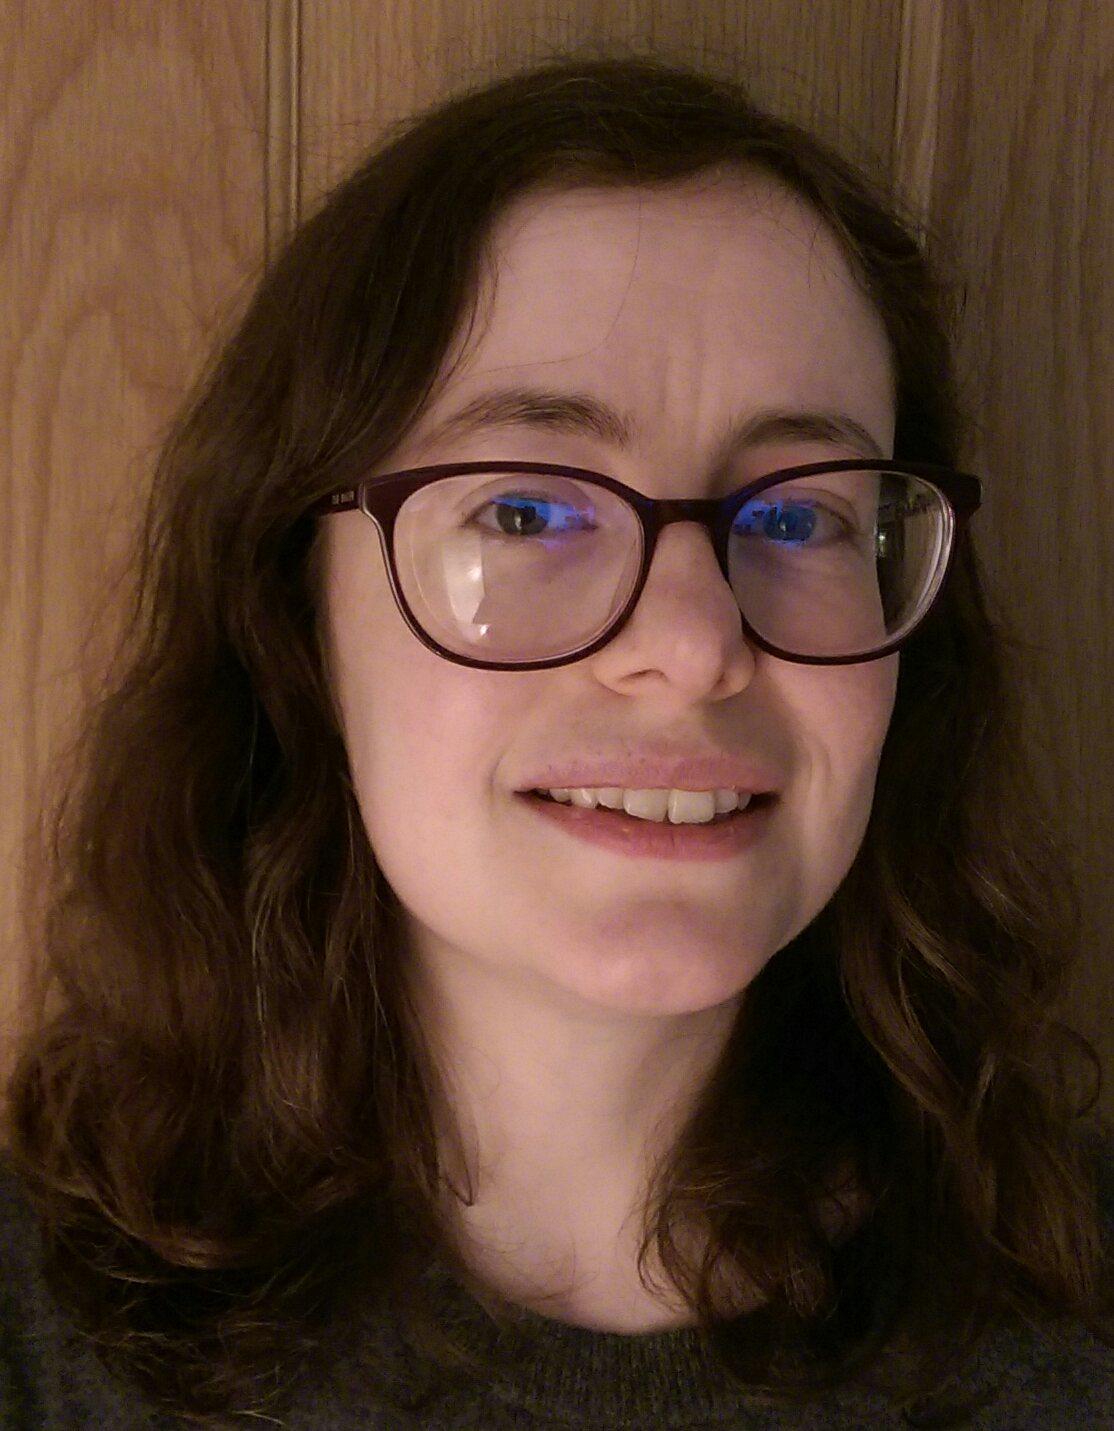 Anna Keyes